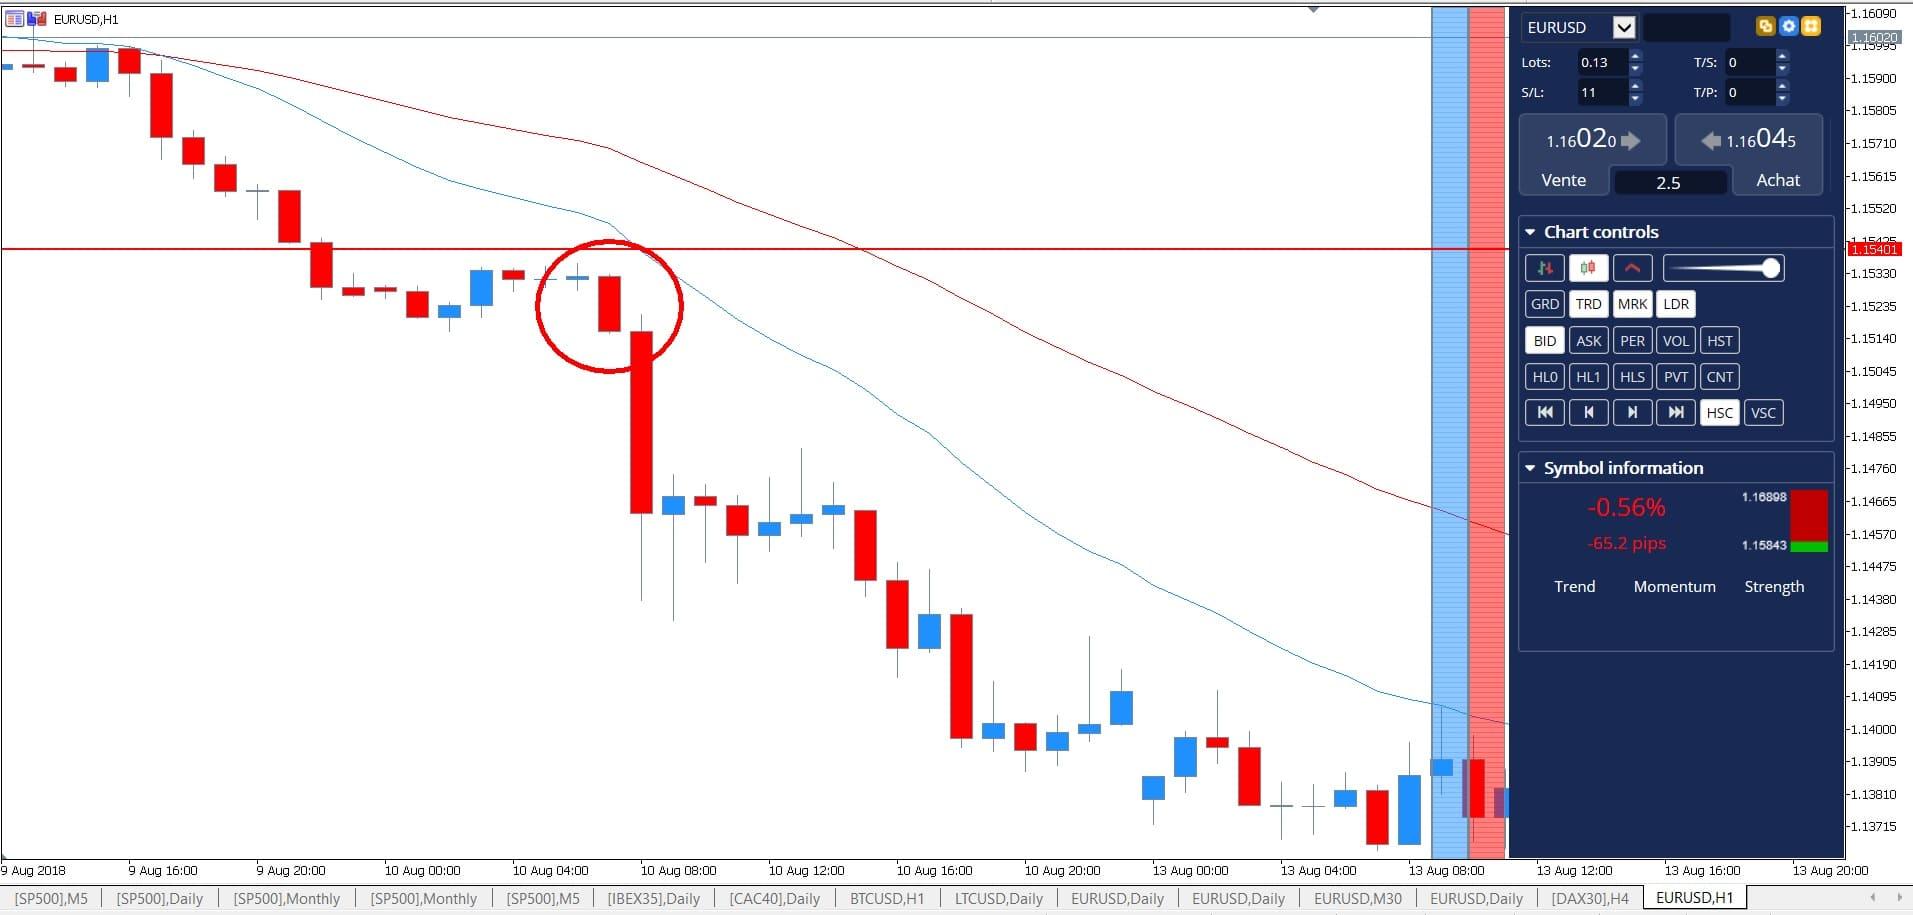 candlestick chart pattern- trading candlesticks